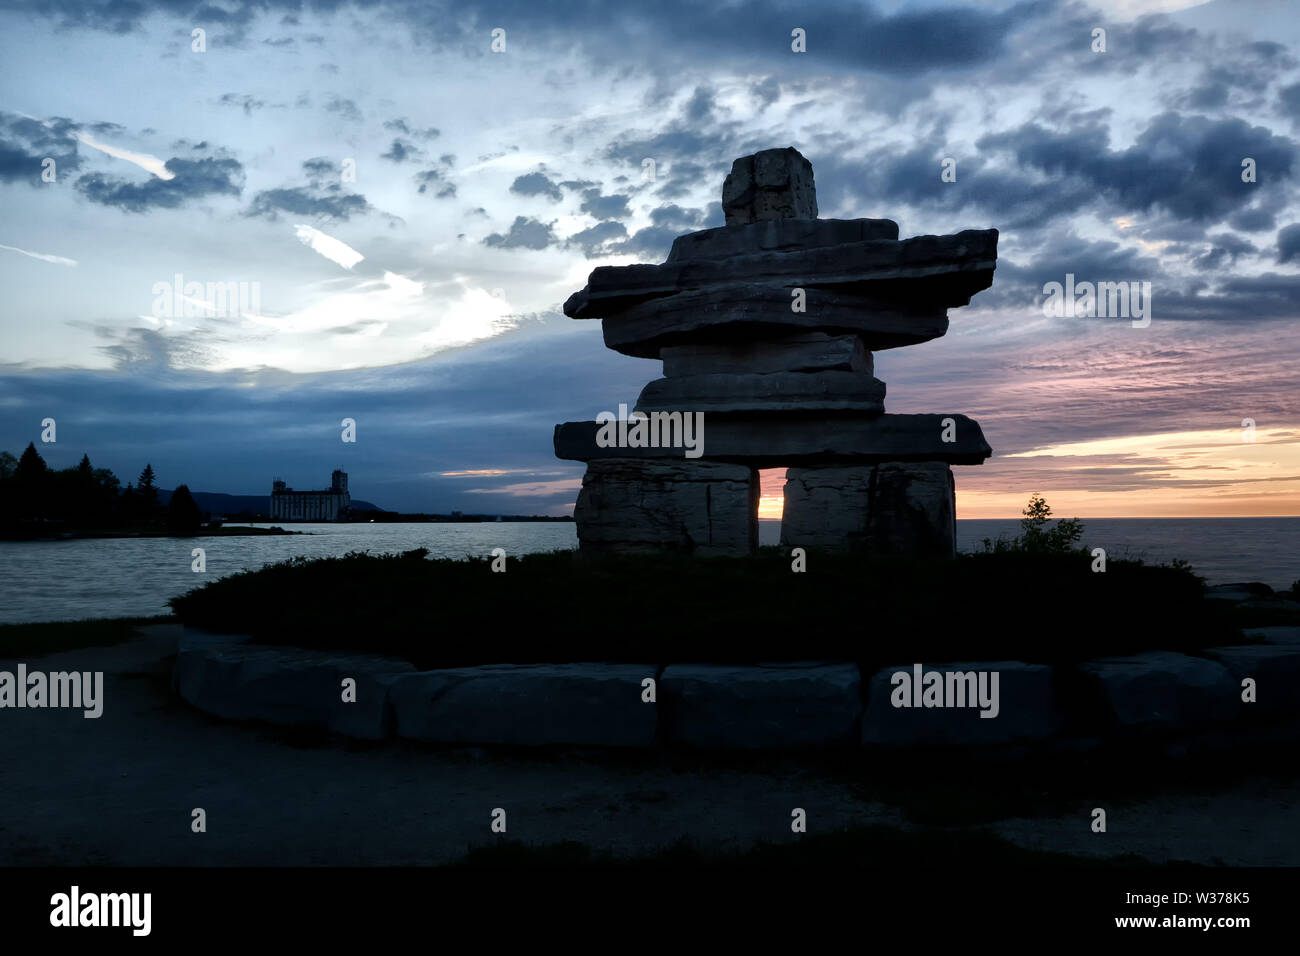 Canada Ontario Collingwood, Inukshuk at Sunset Point at sunset, June 2019, Inushuk Stone Landmark, we were here, Stock Photo